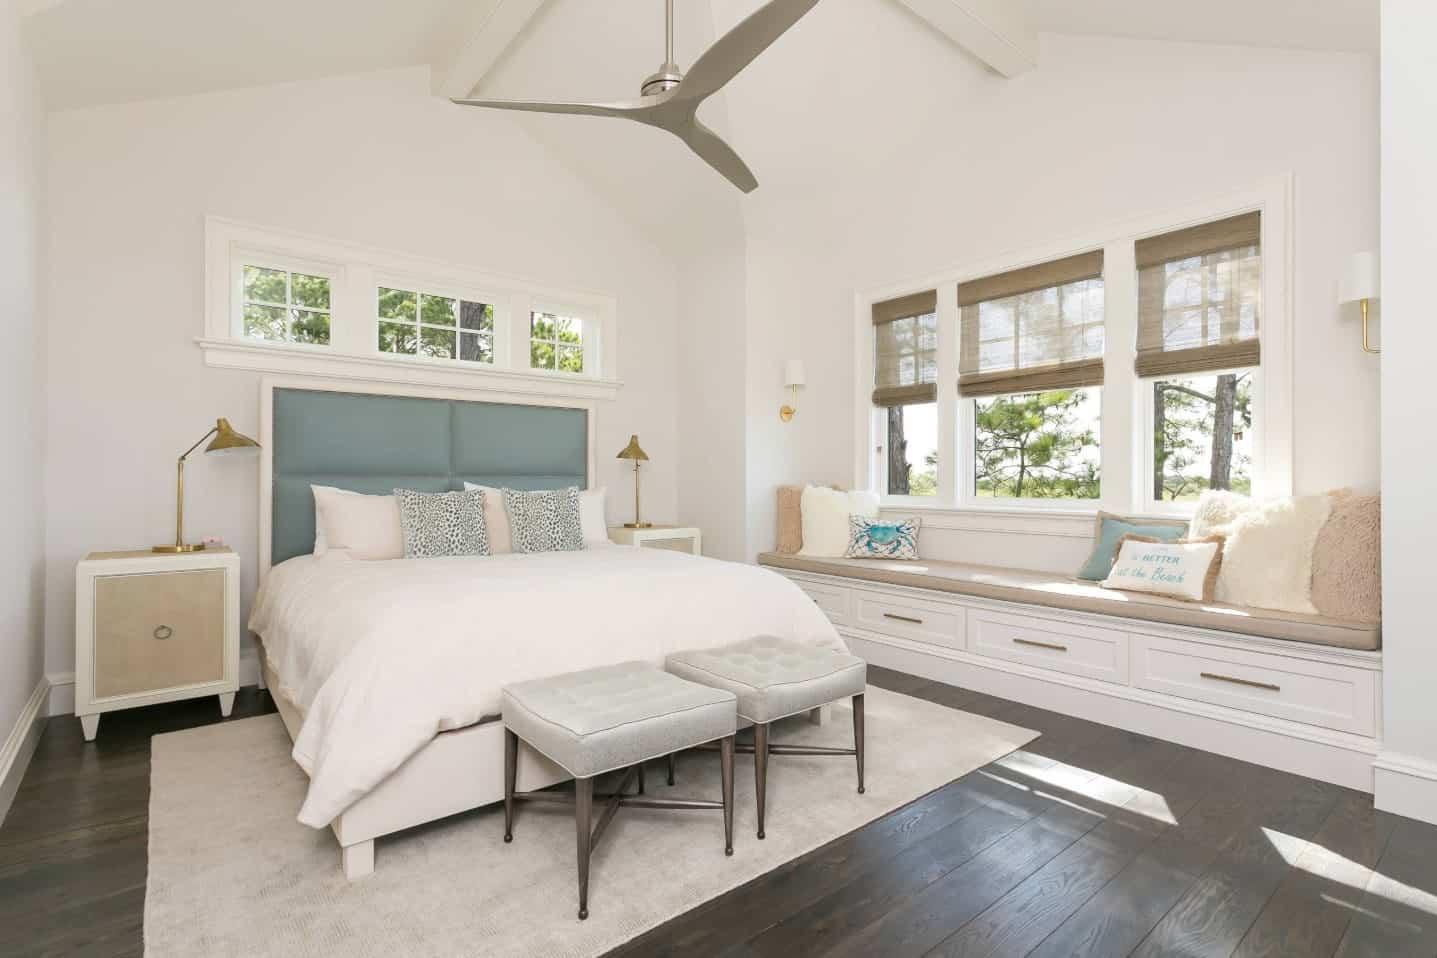 50 Beach Style Master Bedroom Ideas (Photos)